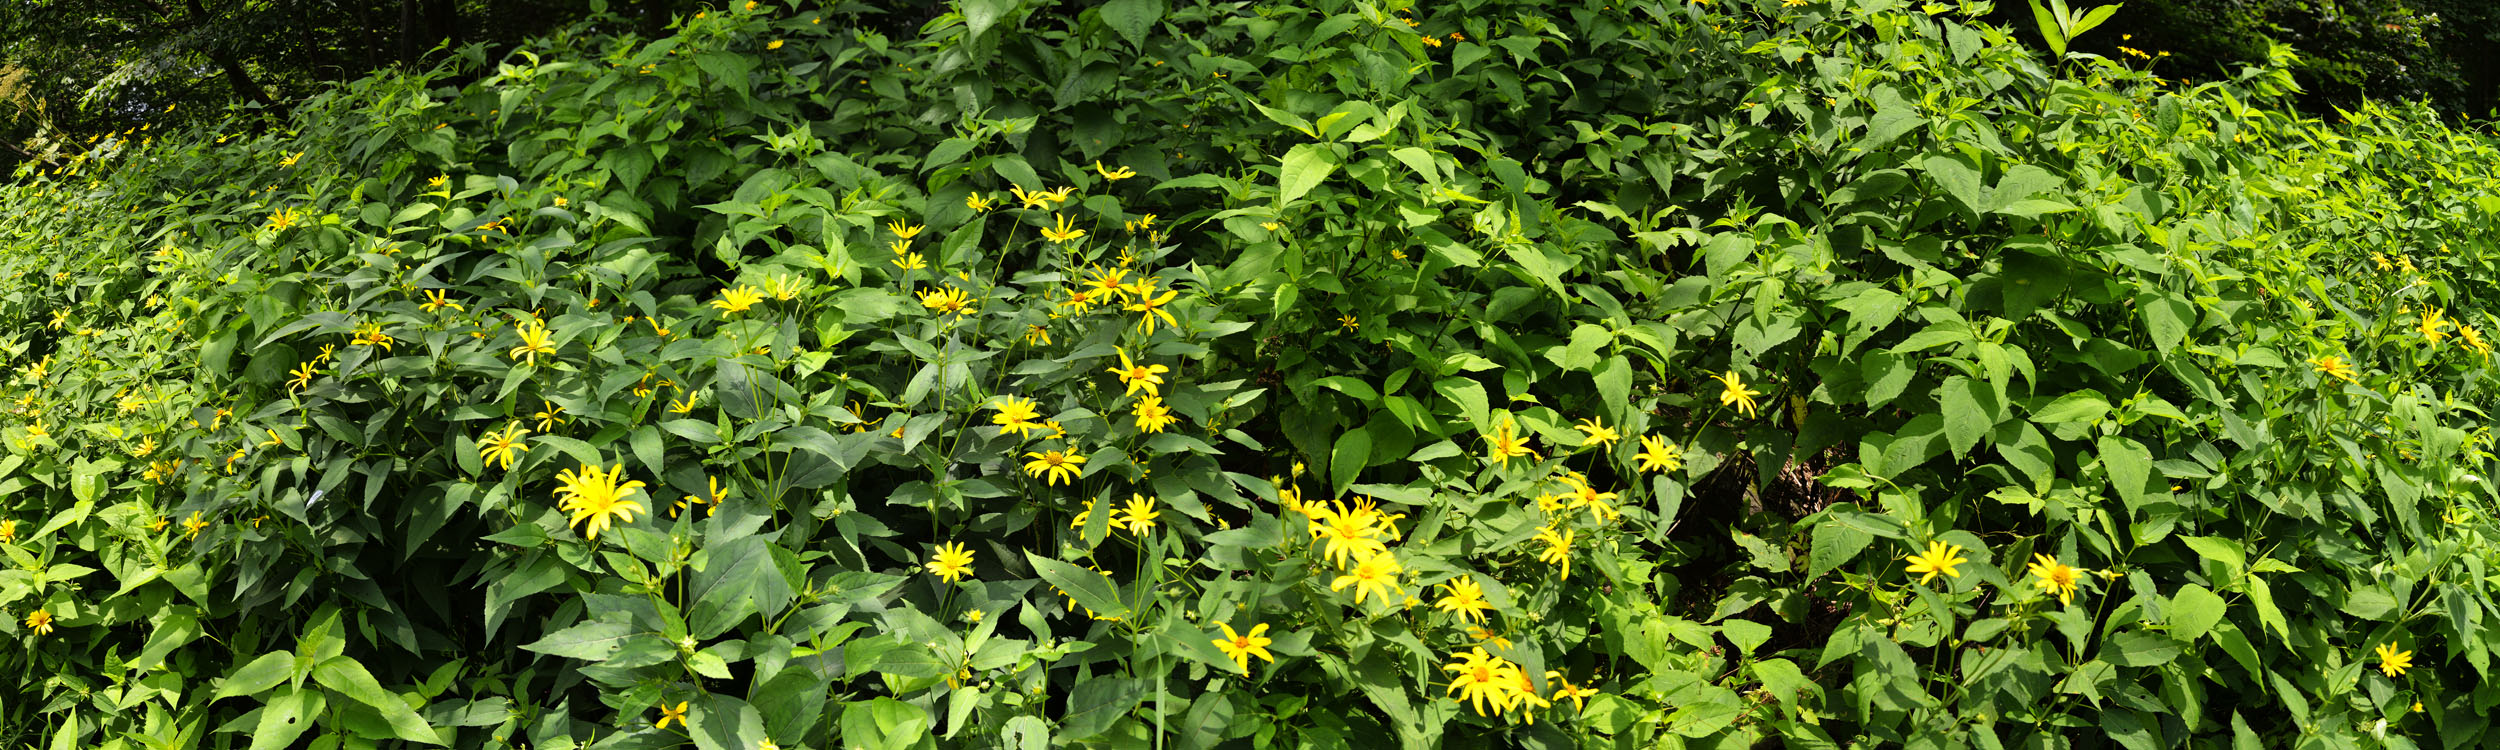 Summer Flowers, Shennandoah NP